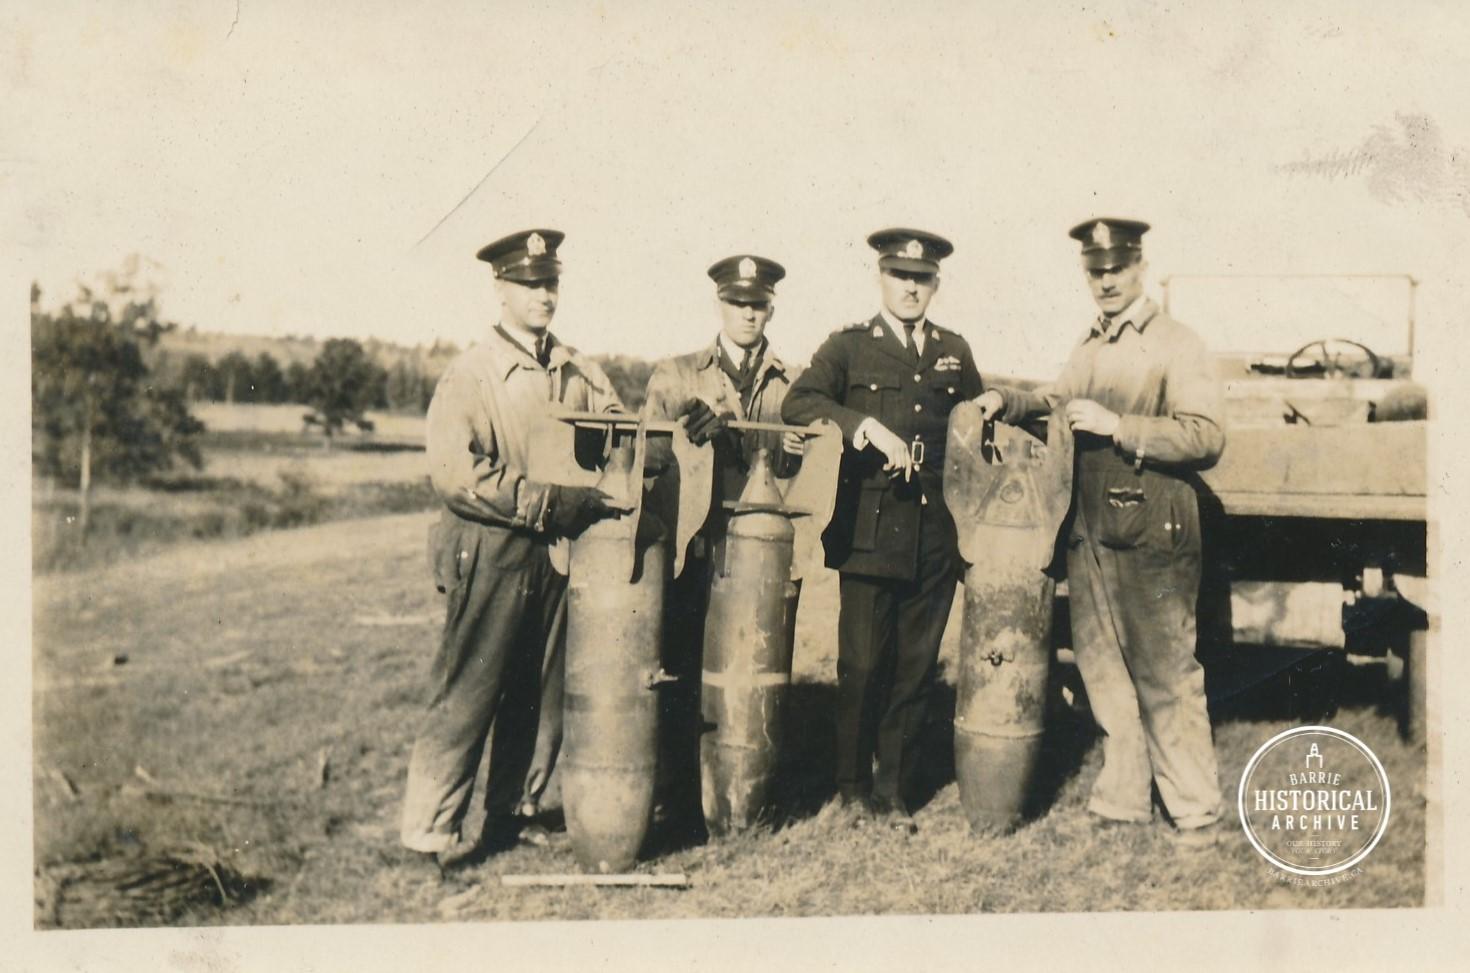 Our military neighbour: Camp Borden